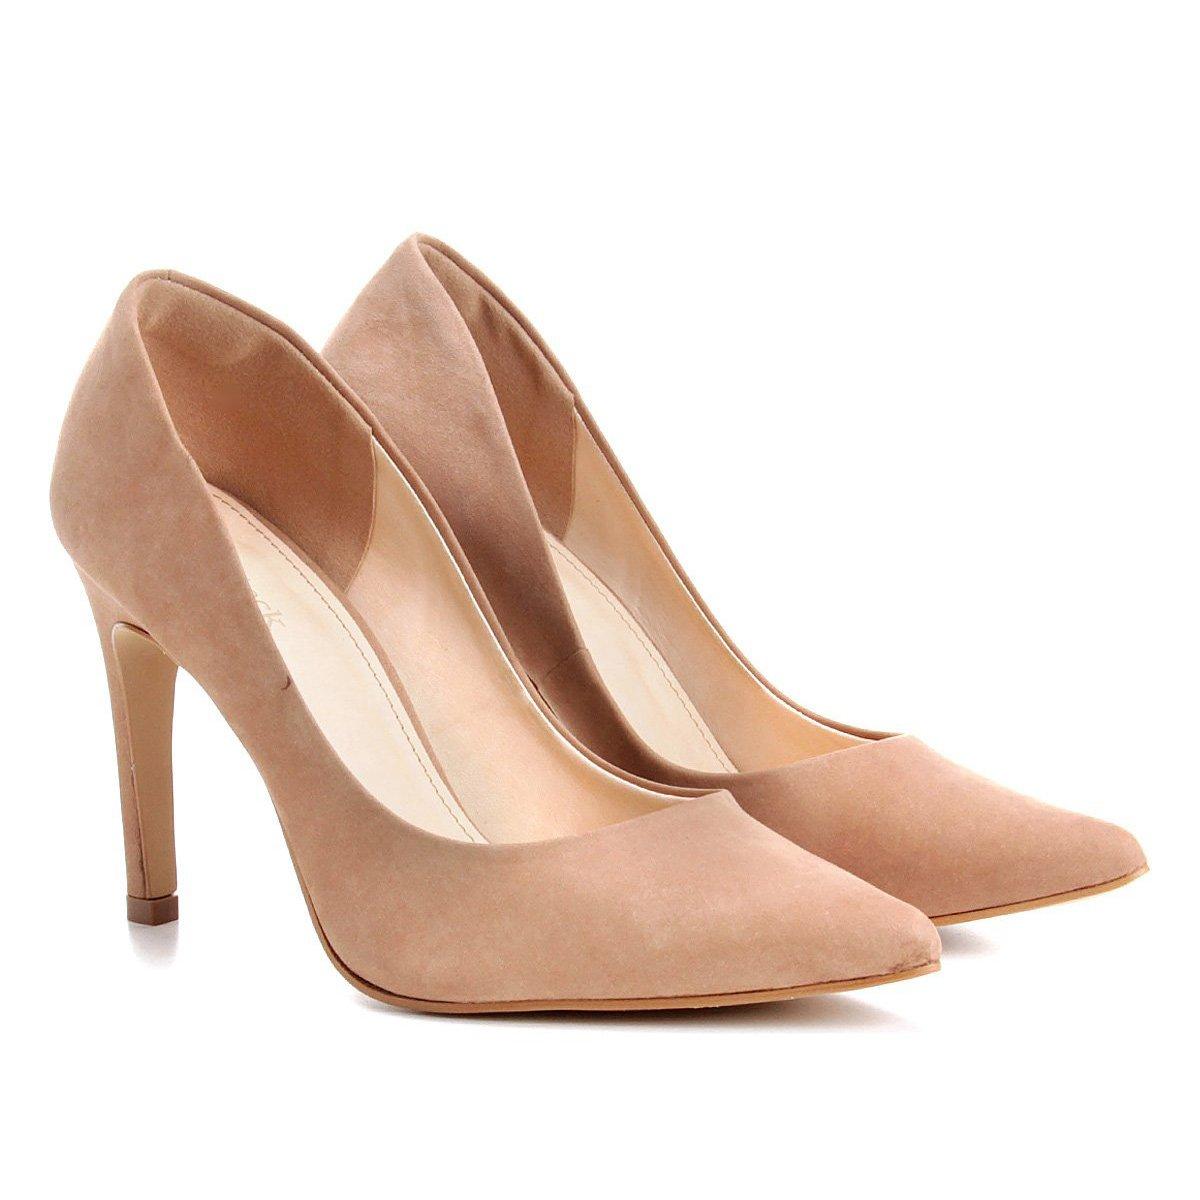 f1acb780a Scarpin Shoestock Salto Alto Bico Fino - Nude | Shoestock